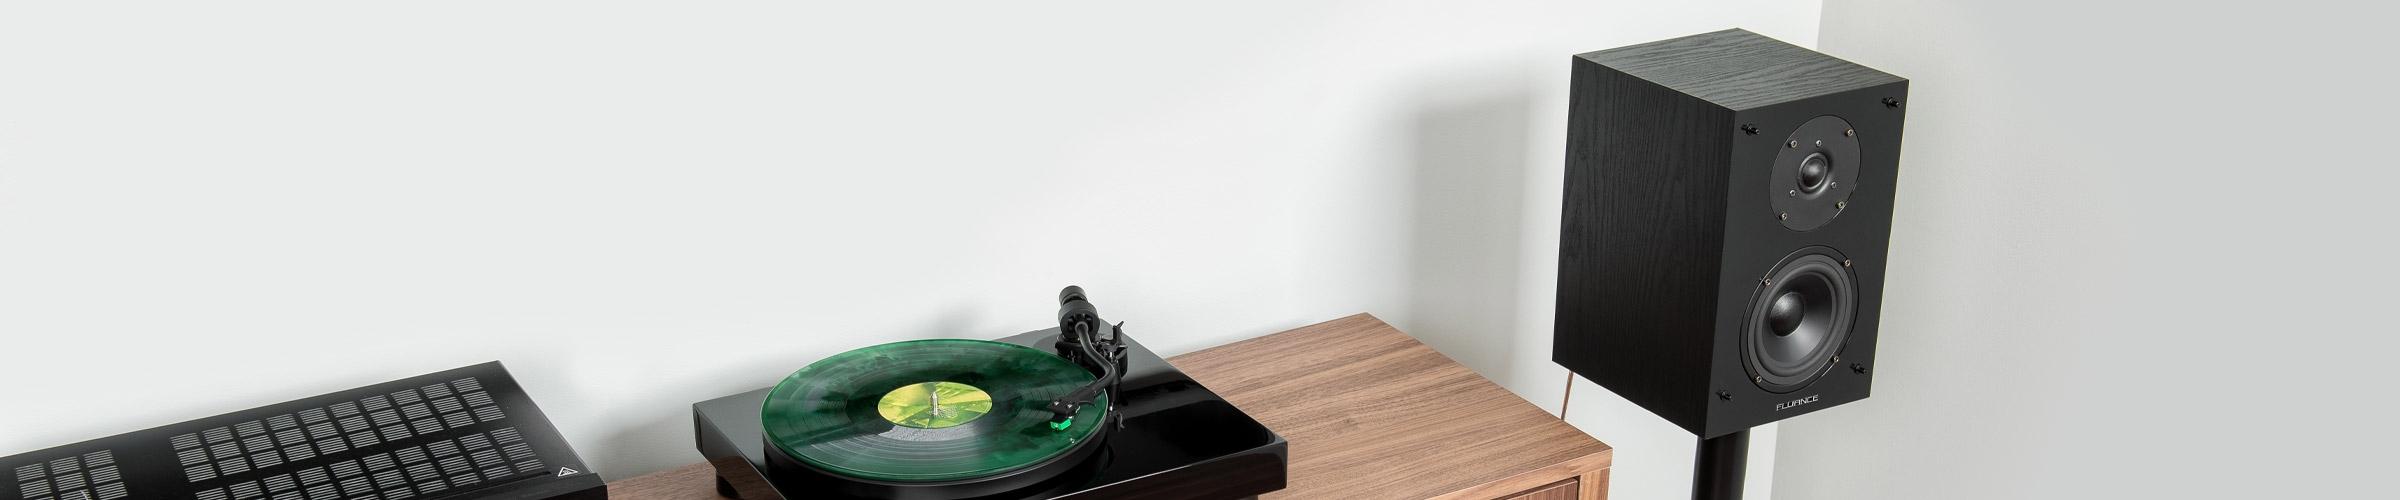 SX6-BK Bookshelf Surround Sound Speakers Intro